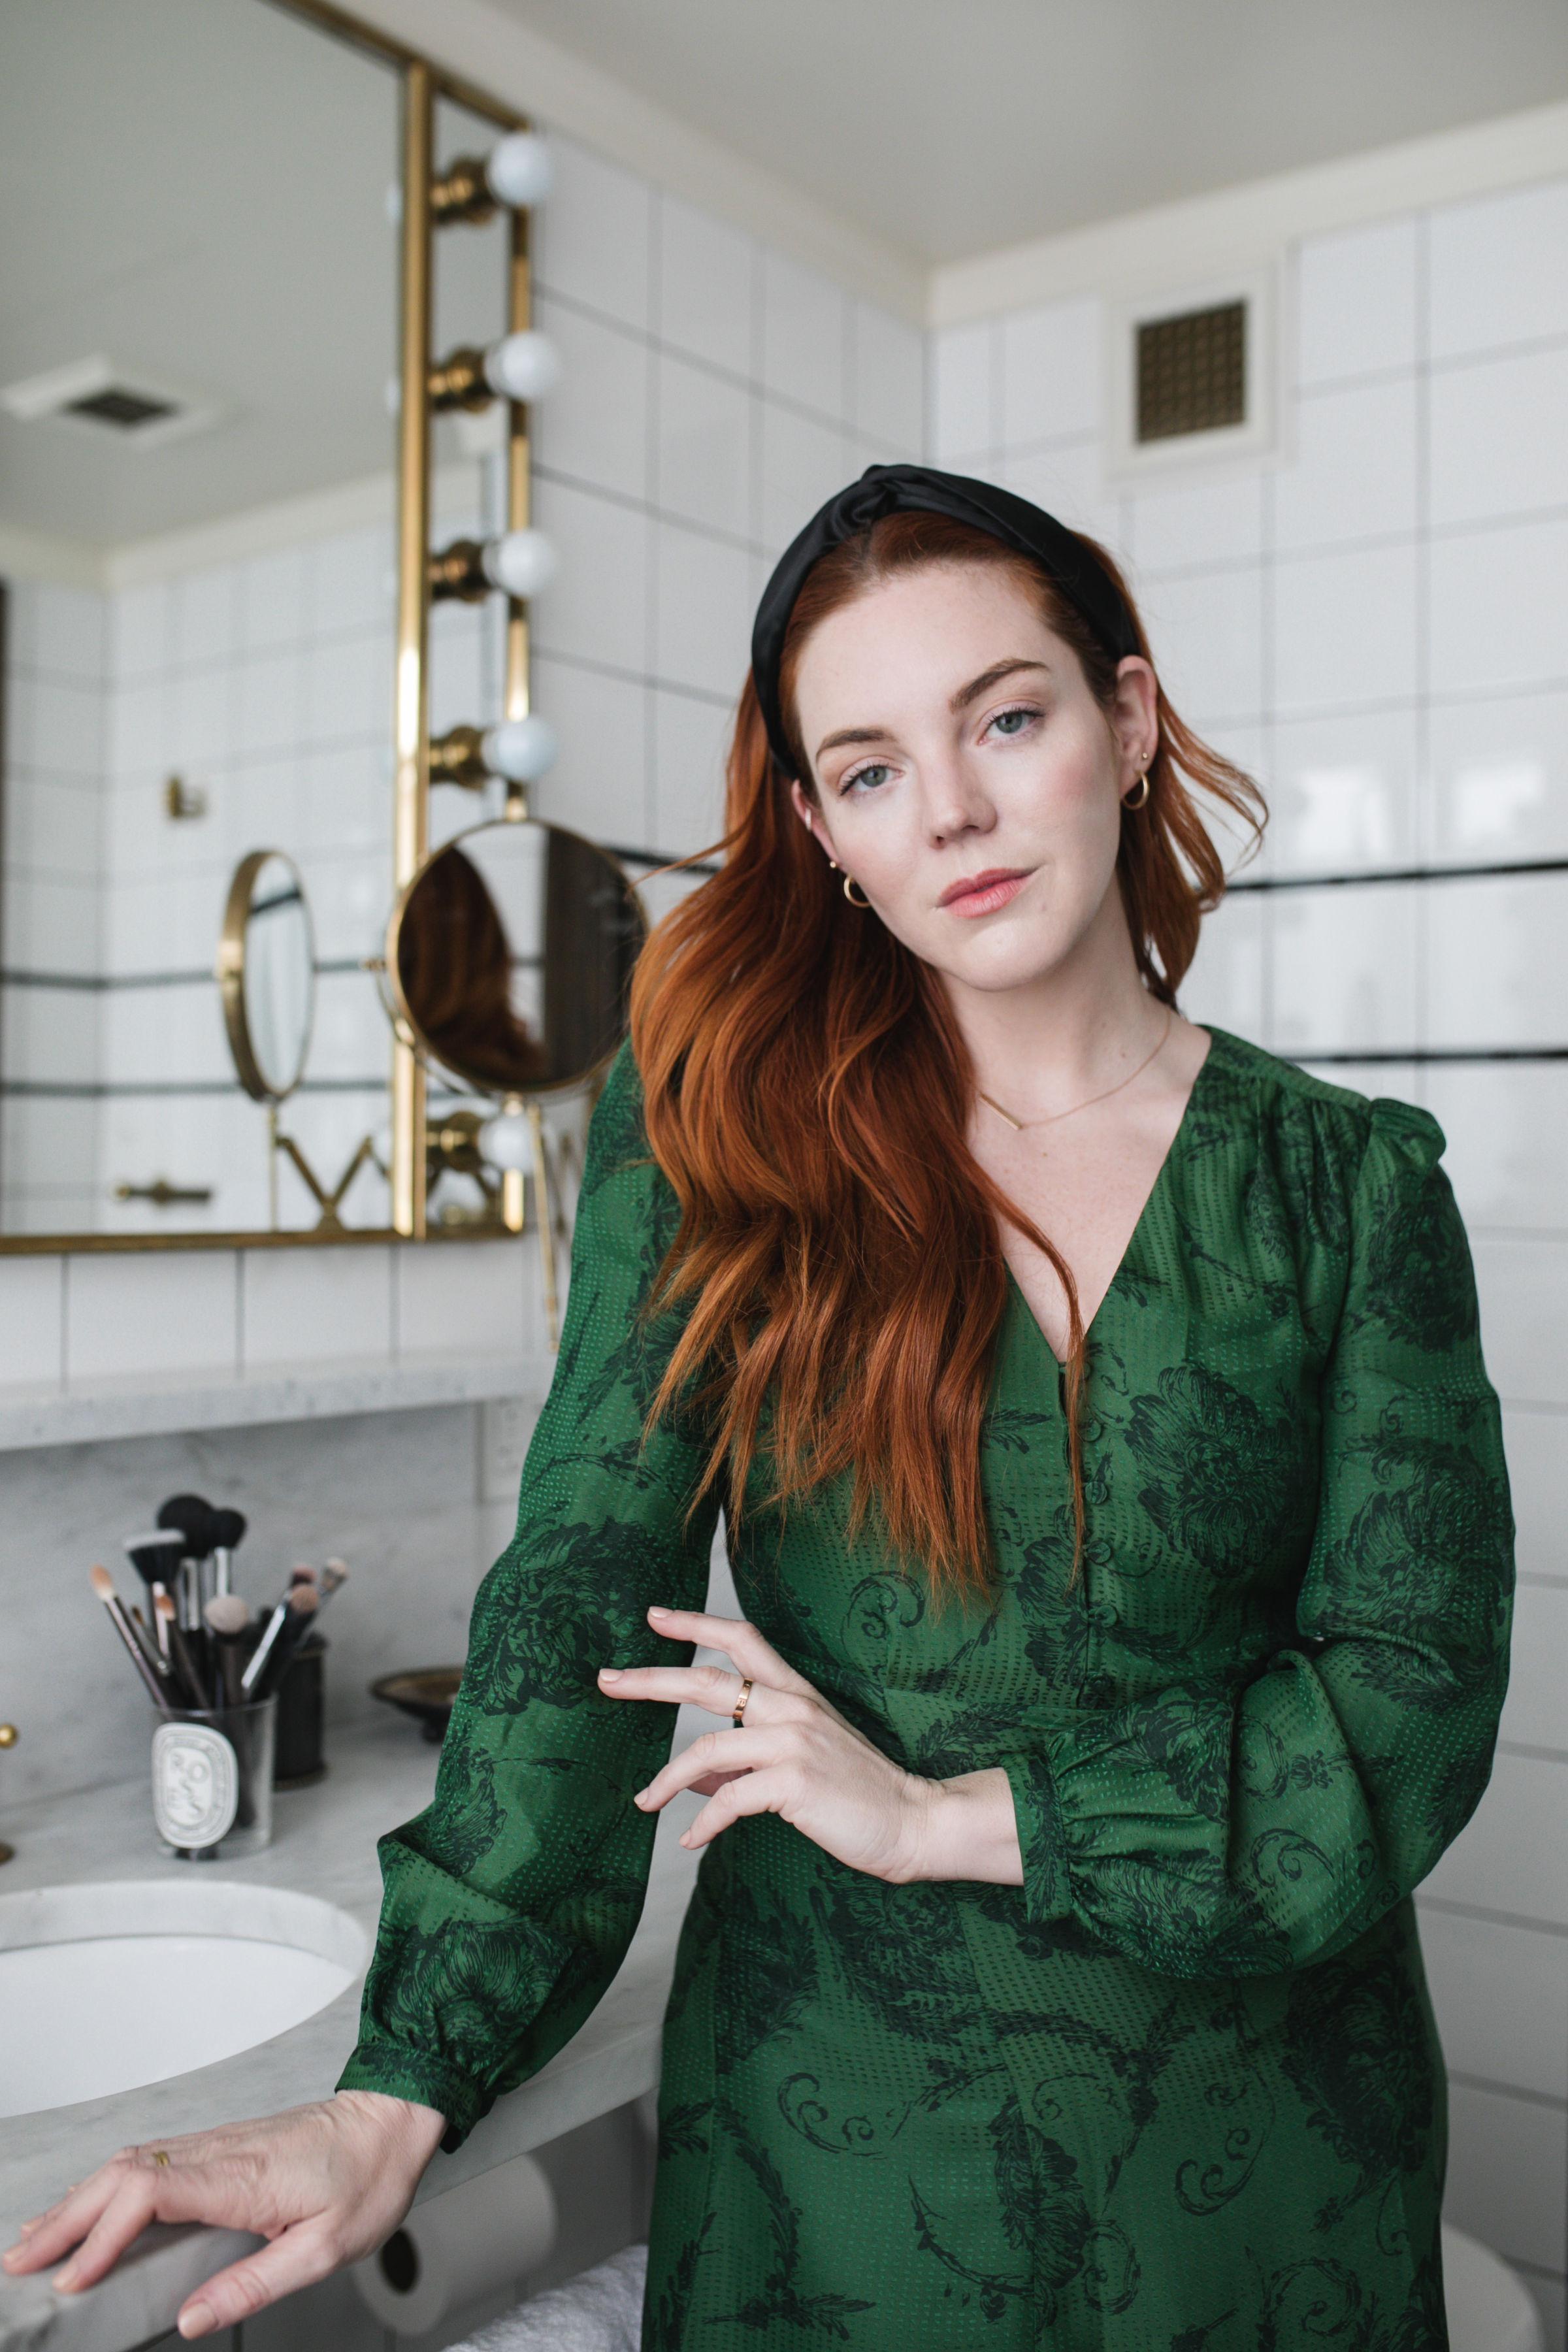 Allison McNamara shares all the details on how she built her successful beauty brand, Mara.